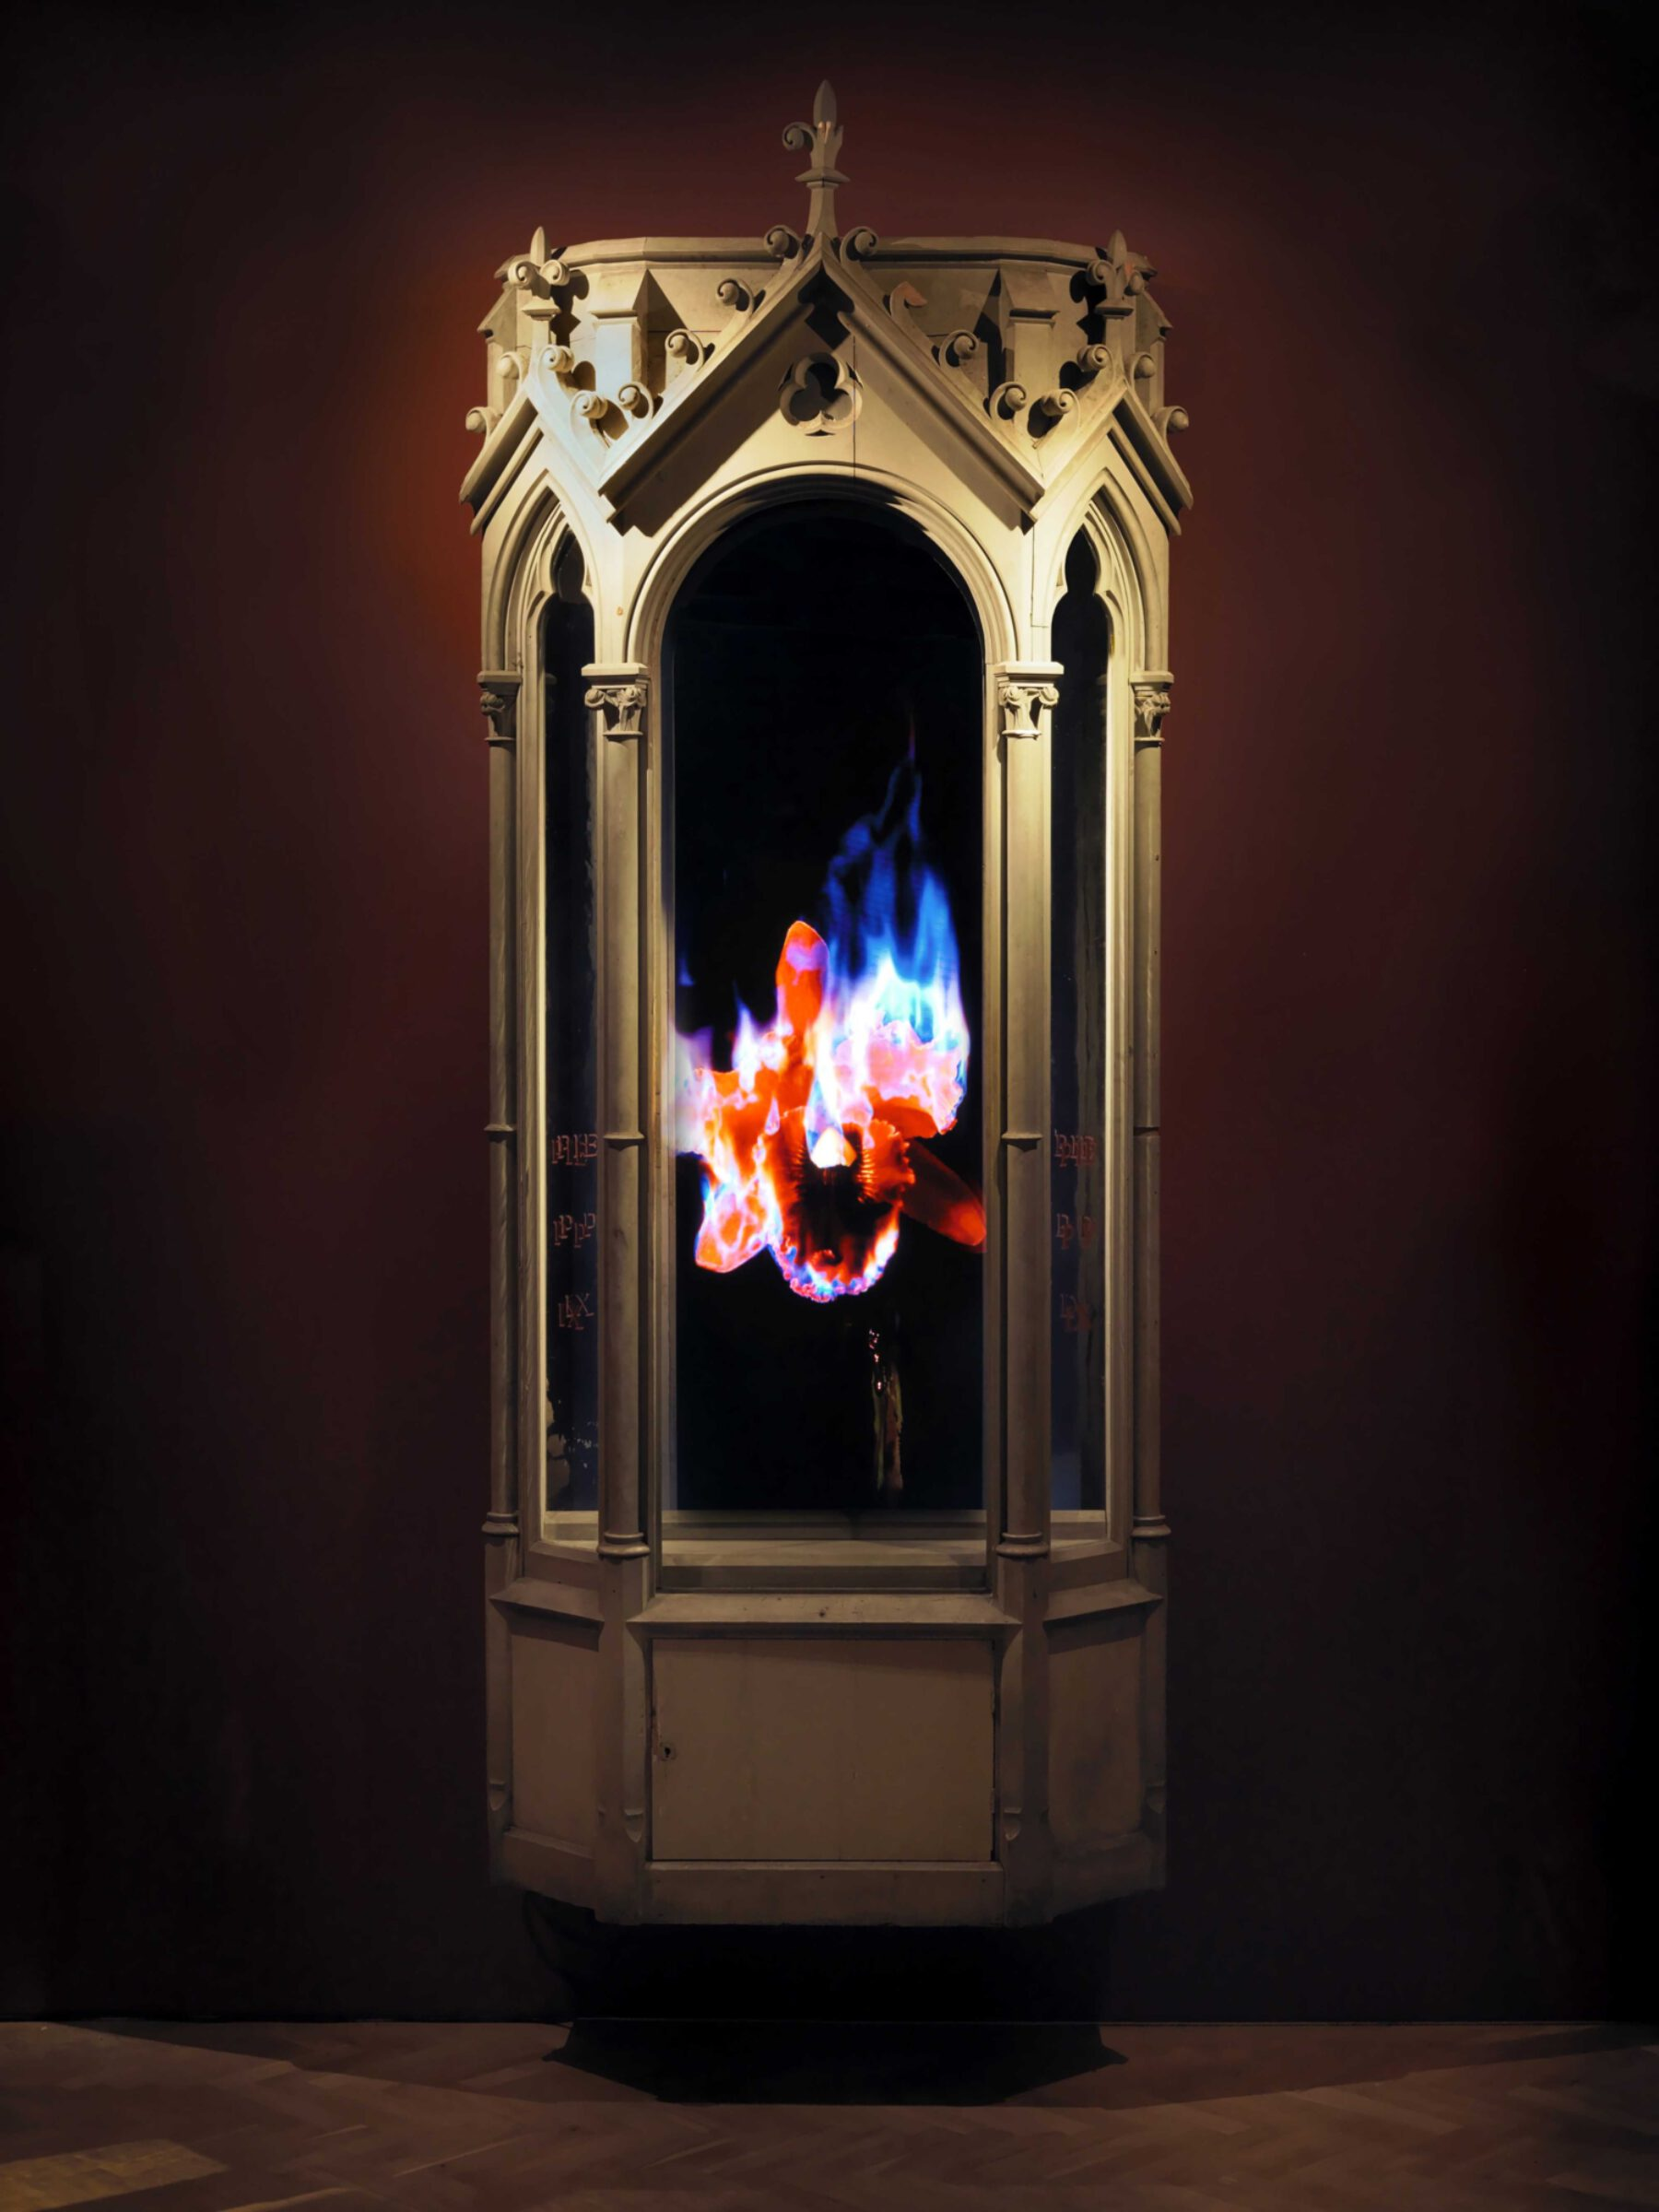 Auto-Immolation